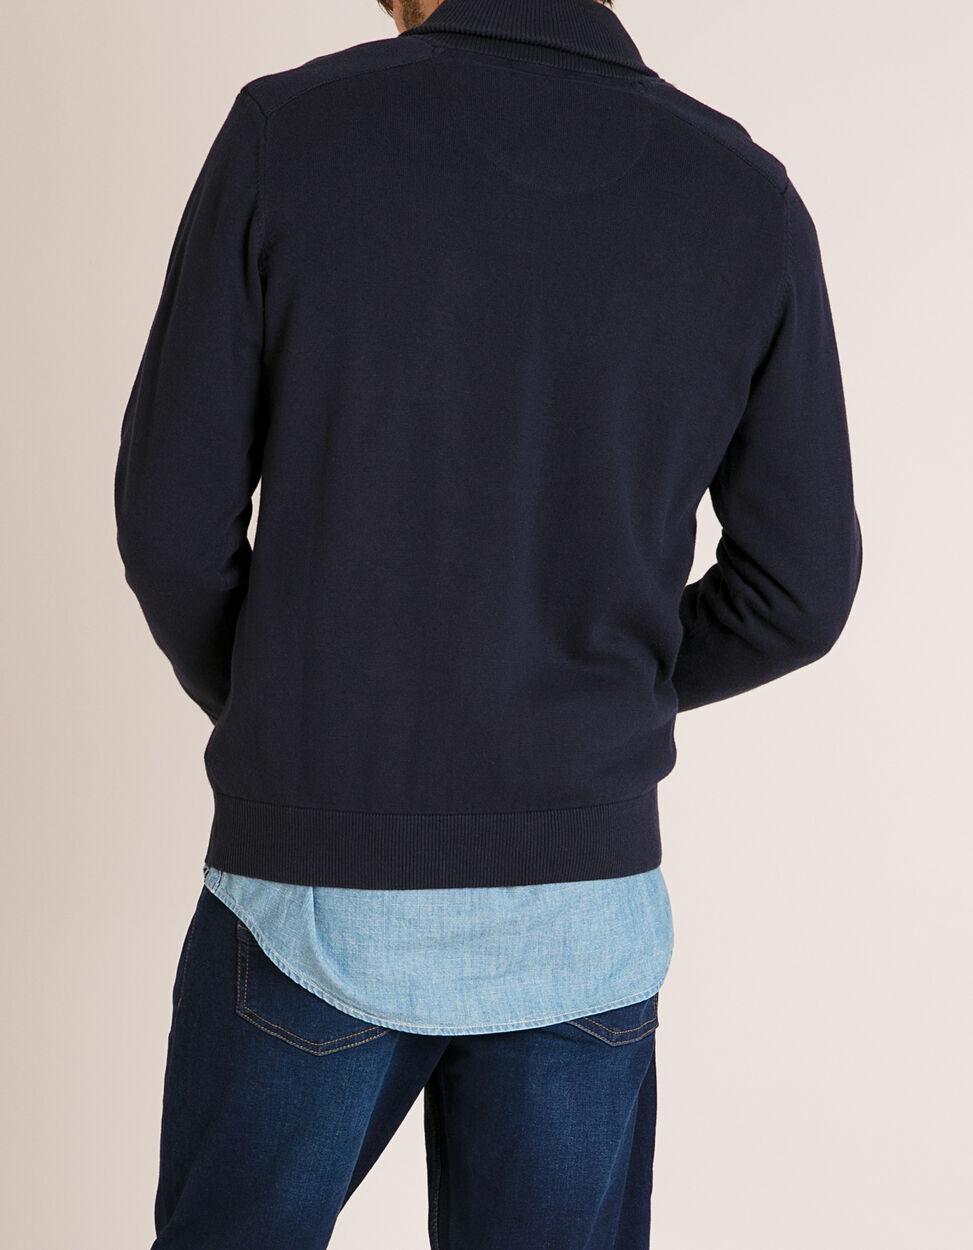 Camisola Gola Rebuço